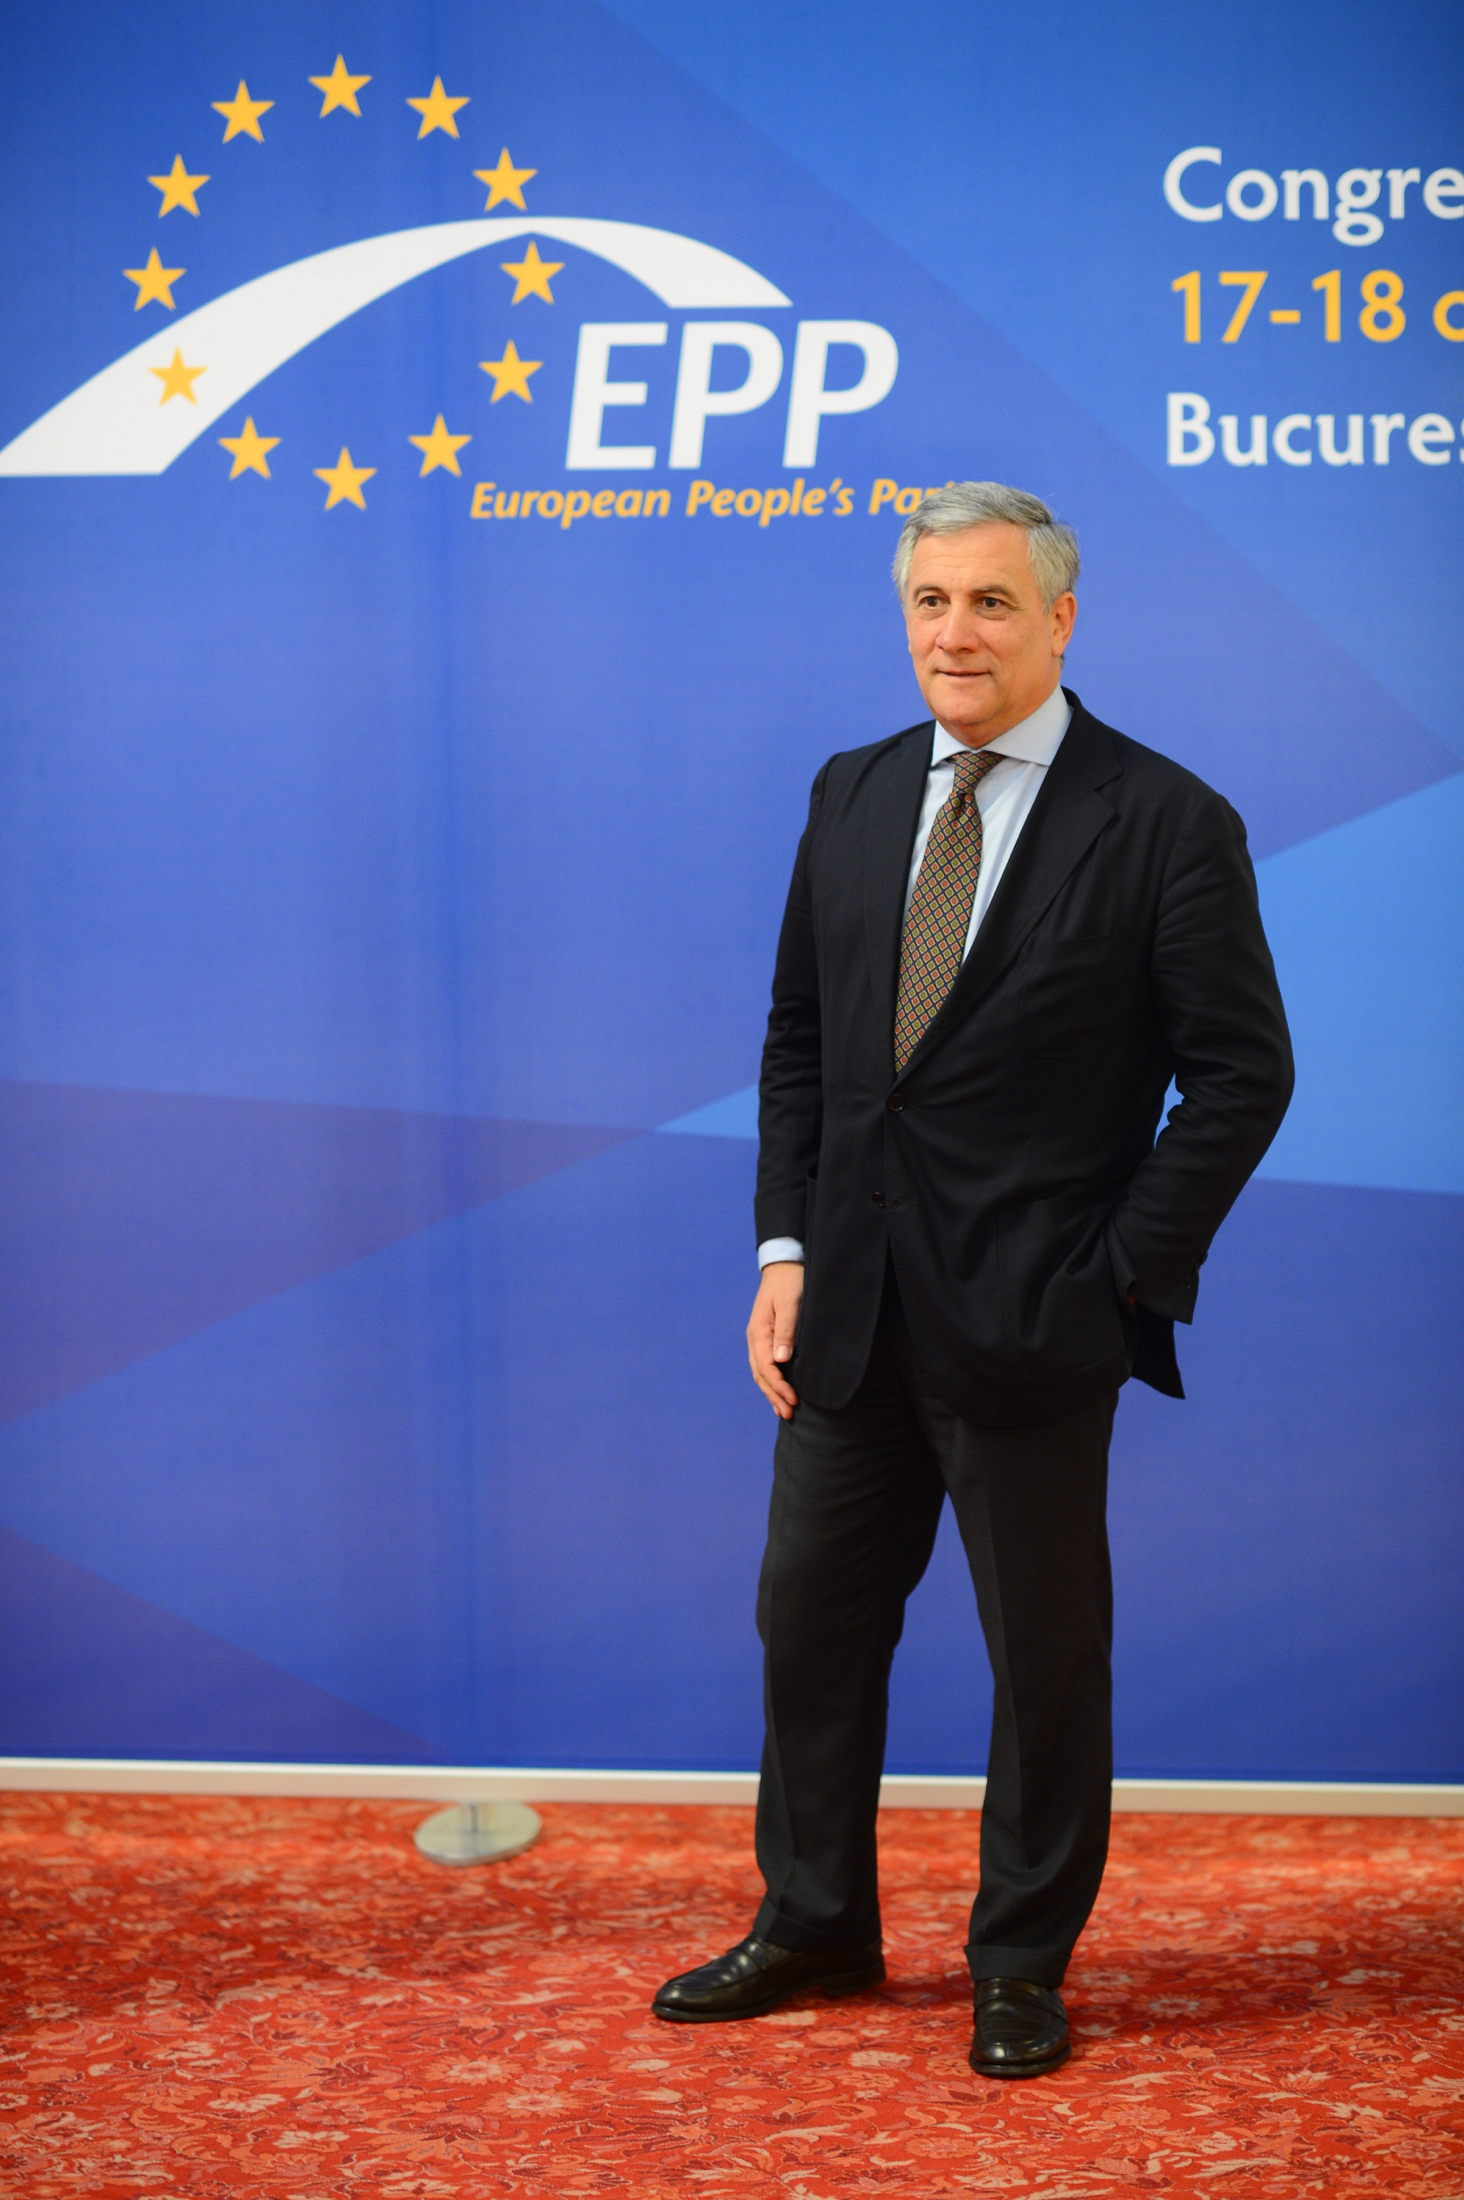 antonio-tajani-presidente-parlamento-europeo